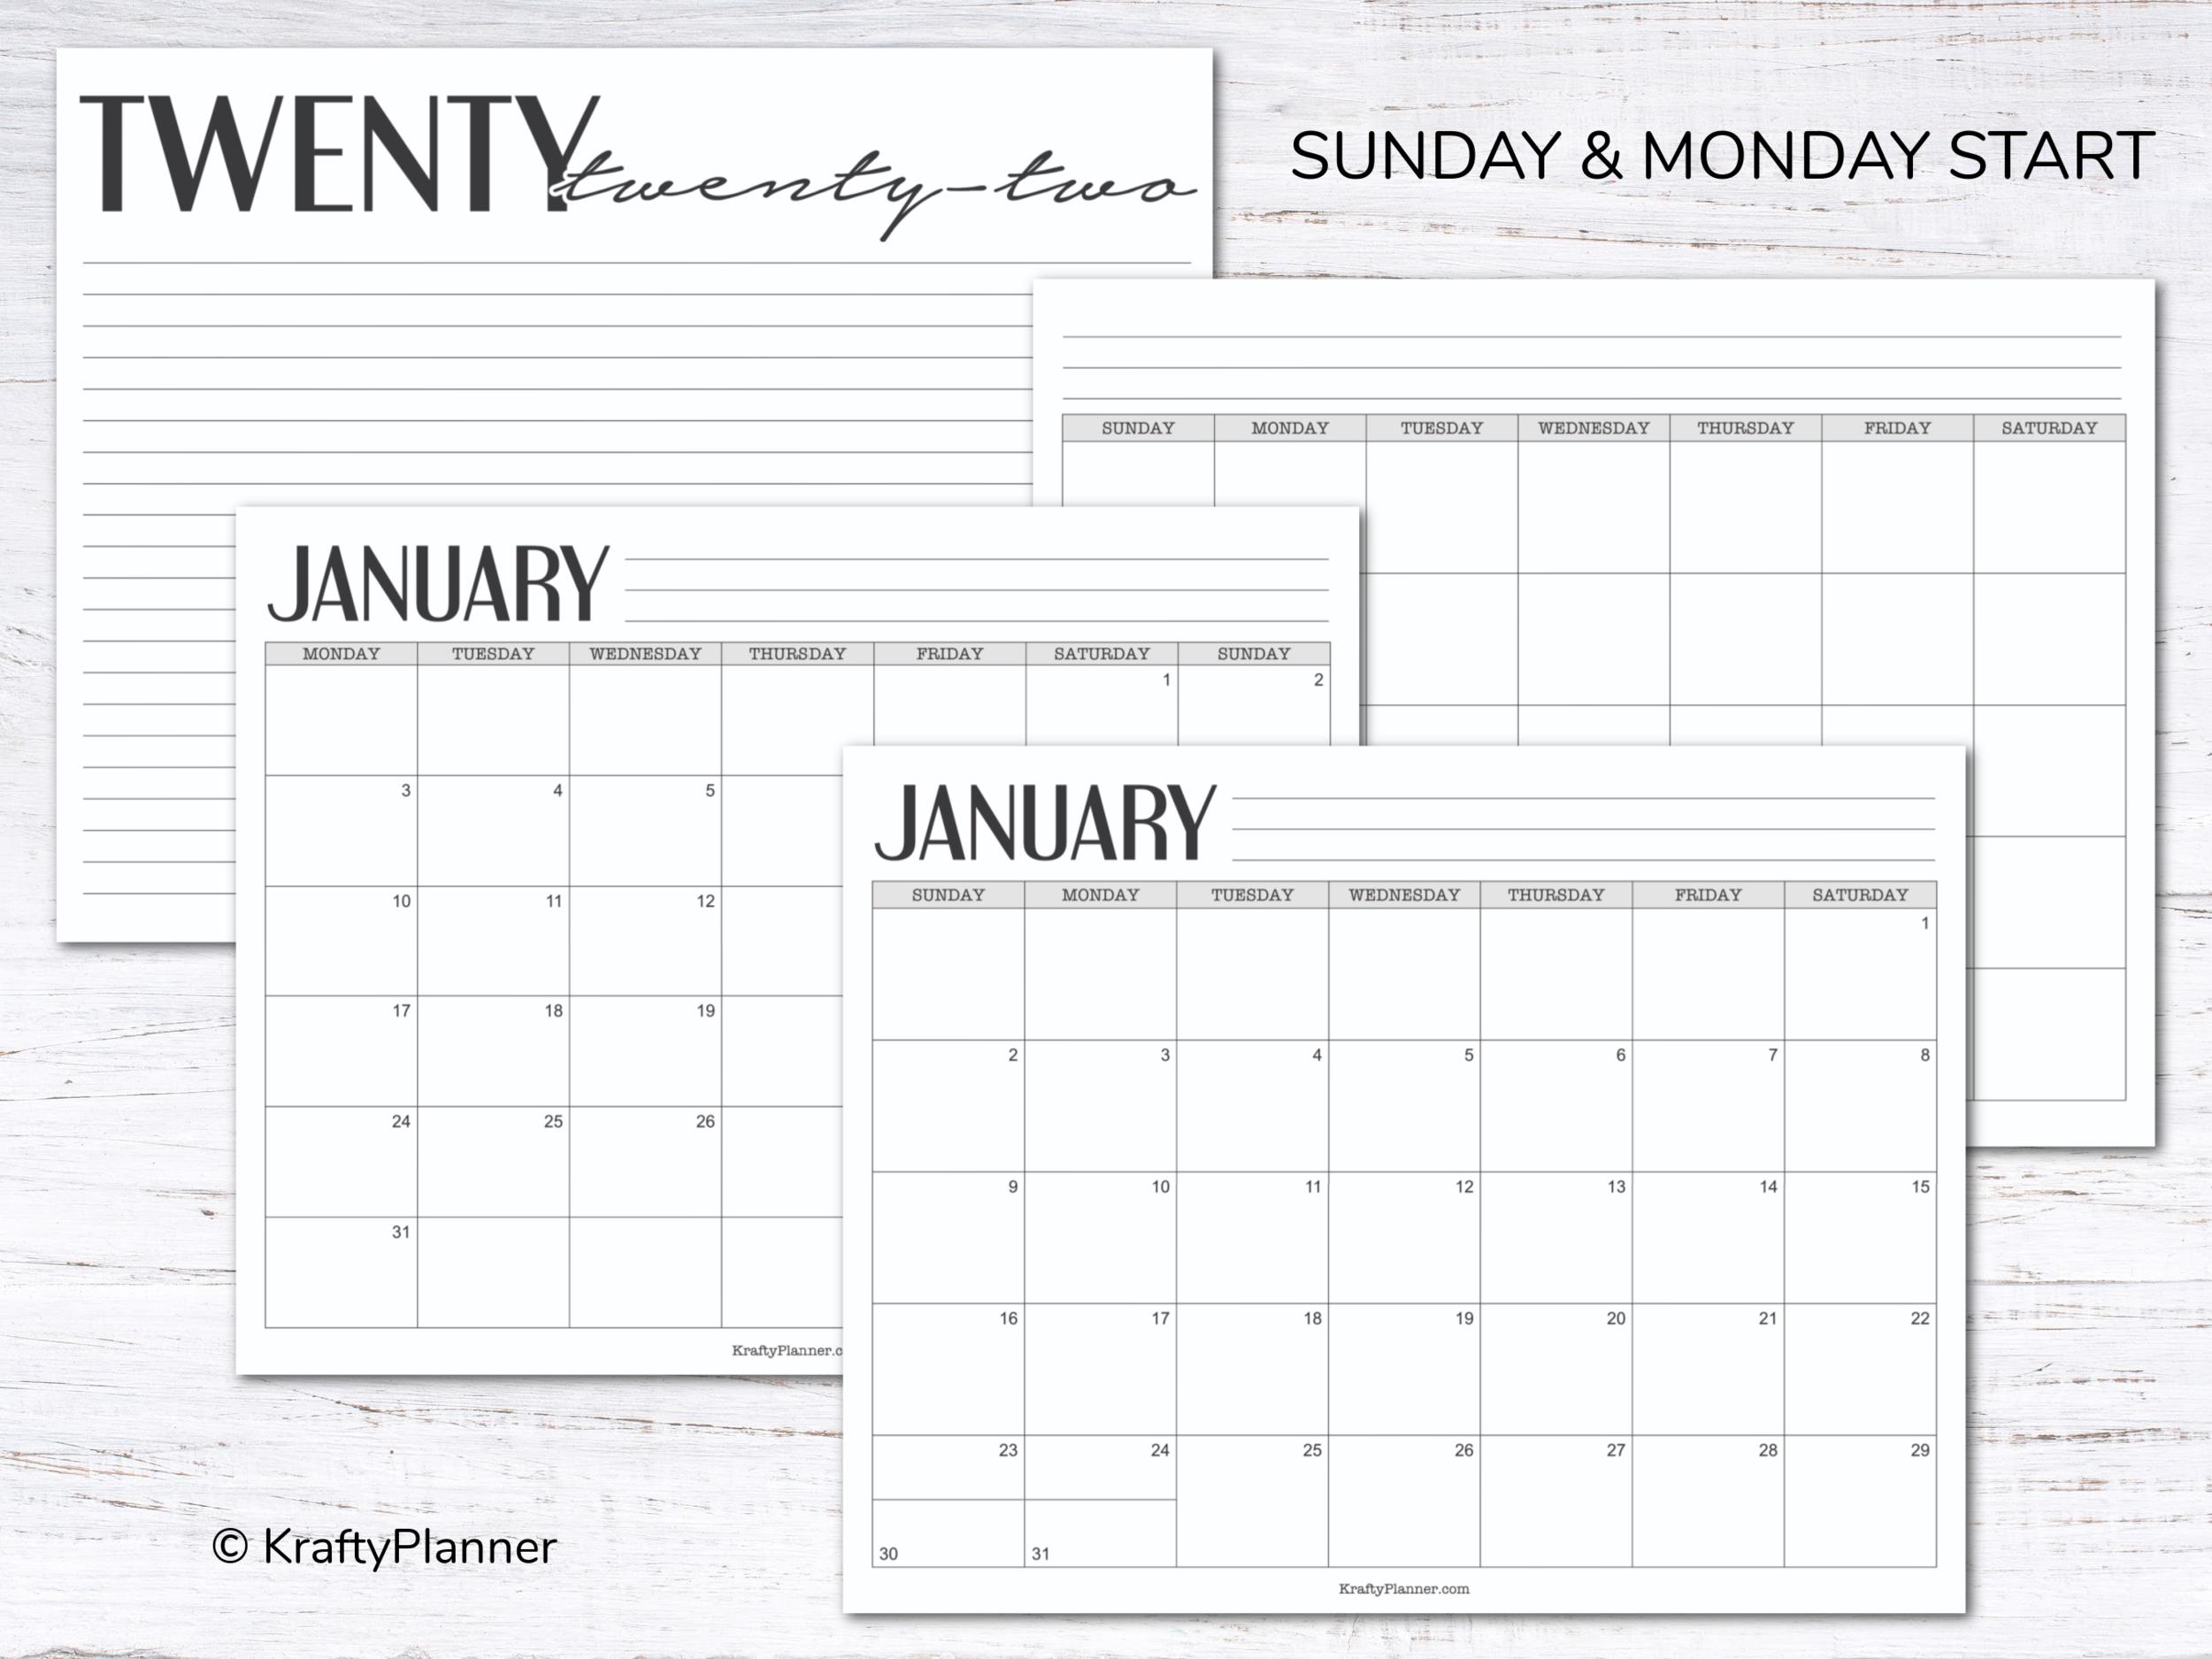 The Krafty Planner 2022 Calendar.png